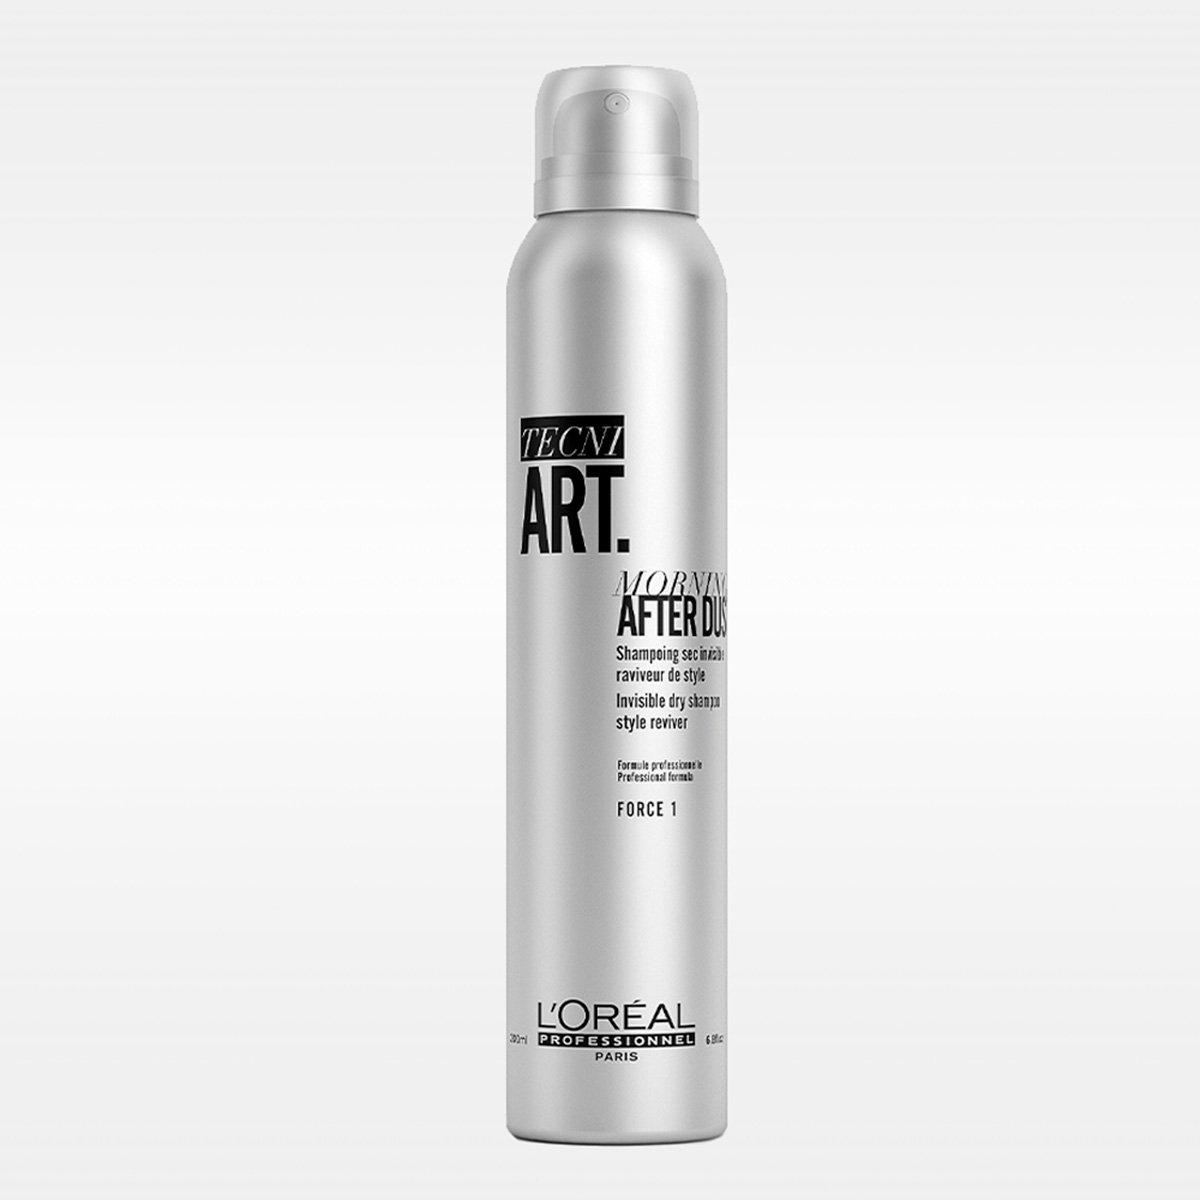 Shampoo a Seco L'Oréal Professionnel Morning After Dust Tecni Art 200ml